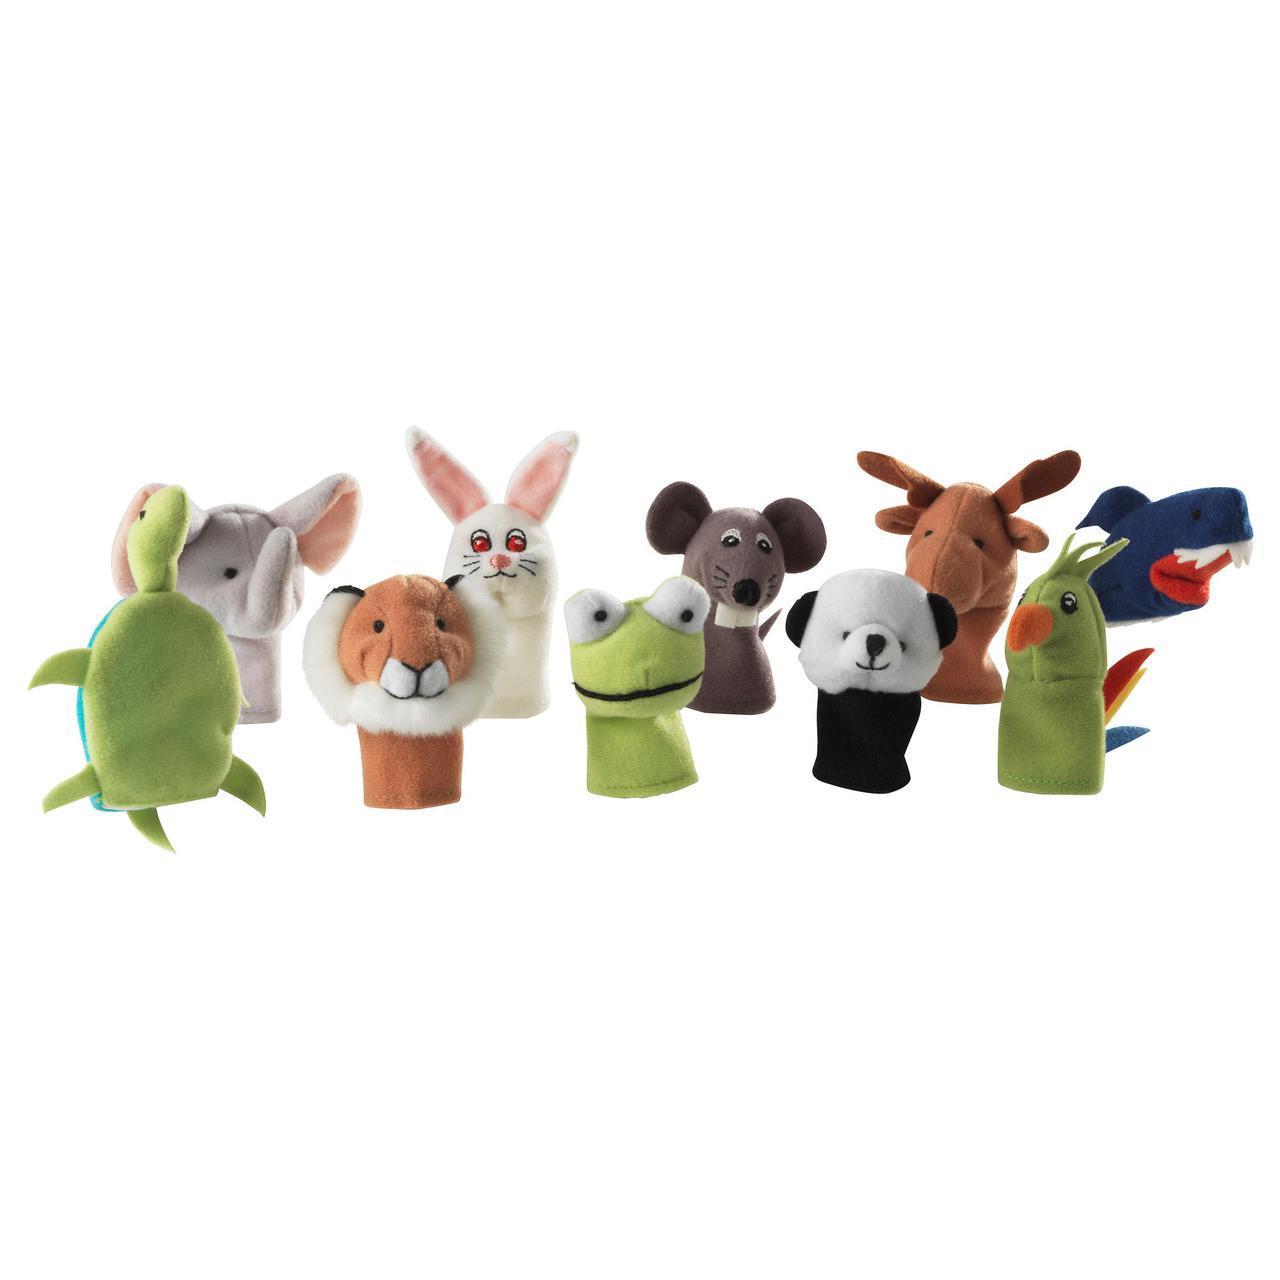 ✅ IKEA TITTA DJUR (101.592.78) Набор кукол на палец, разные цвета, разные цвета